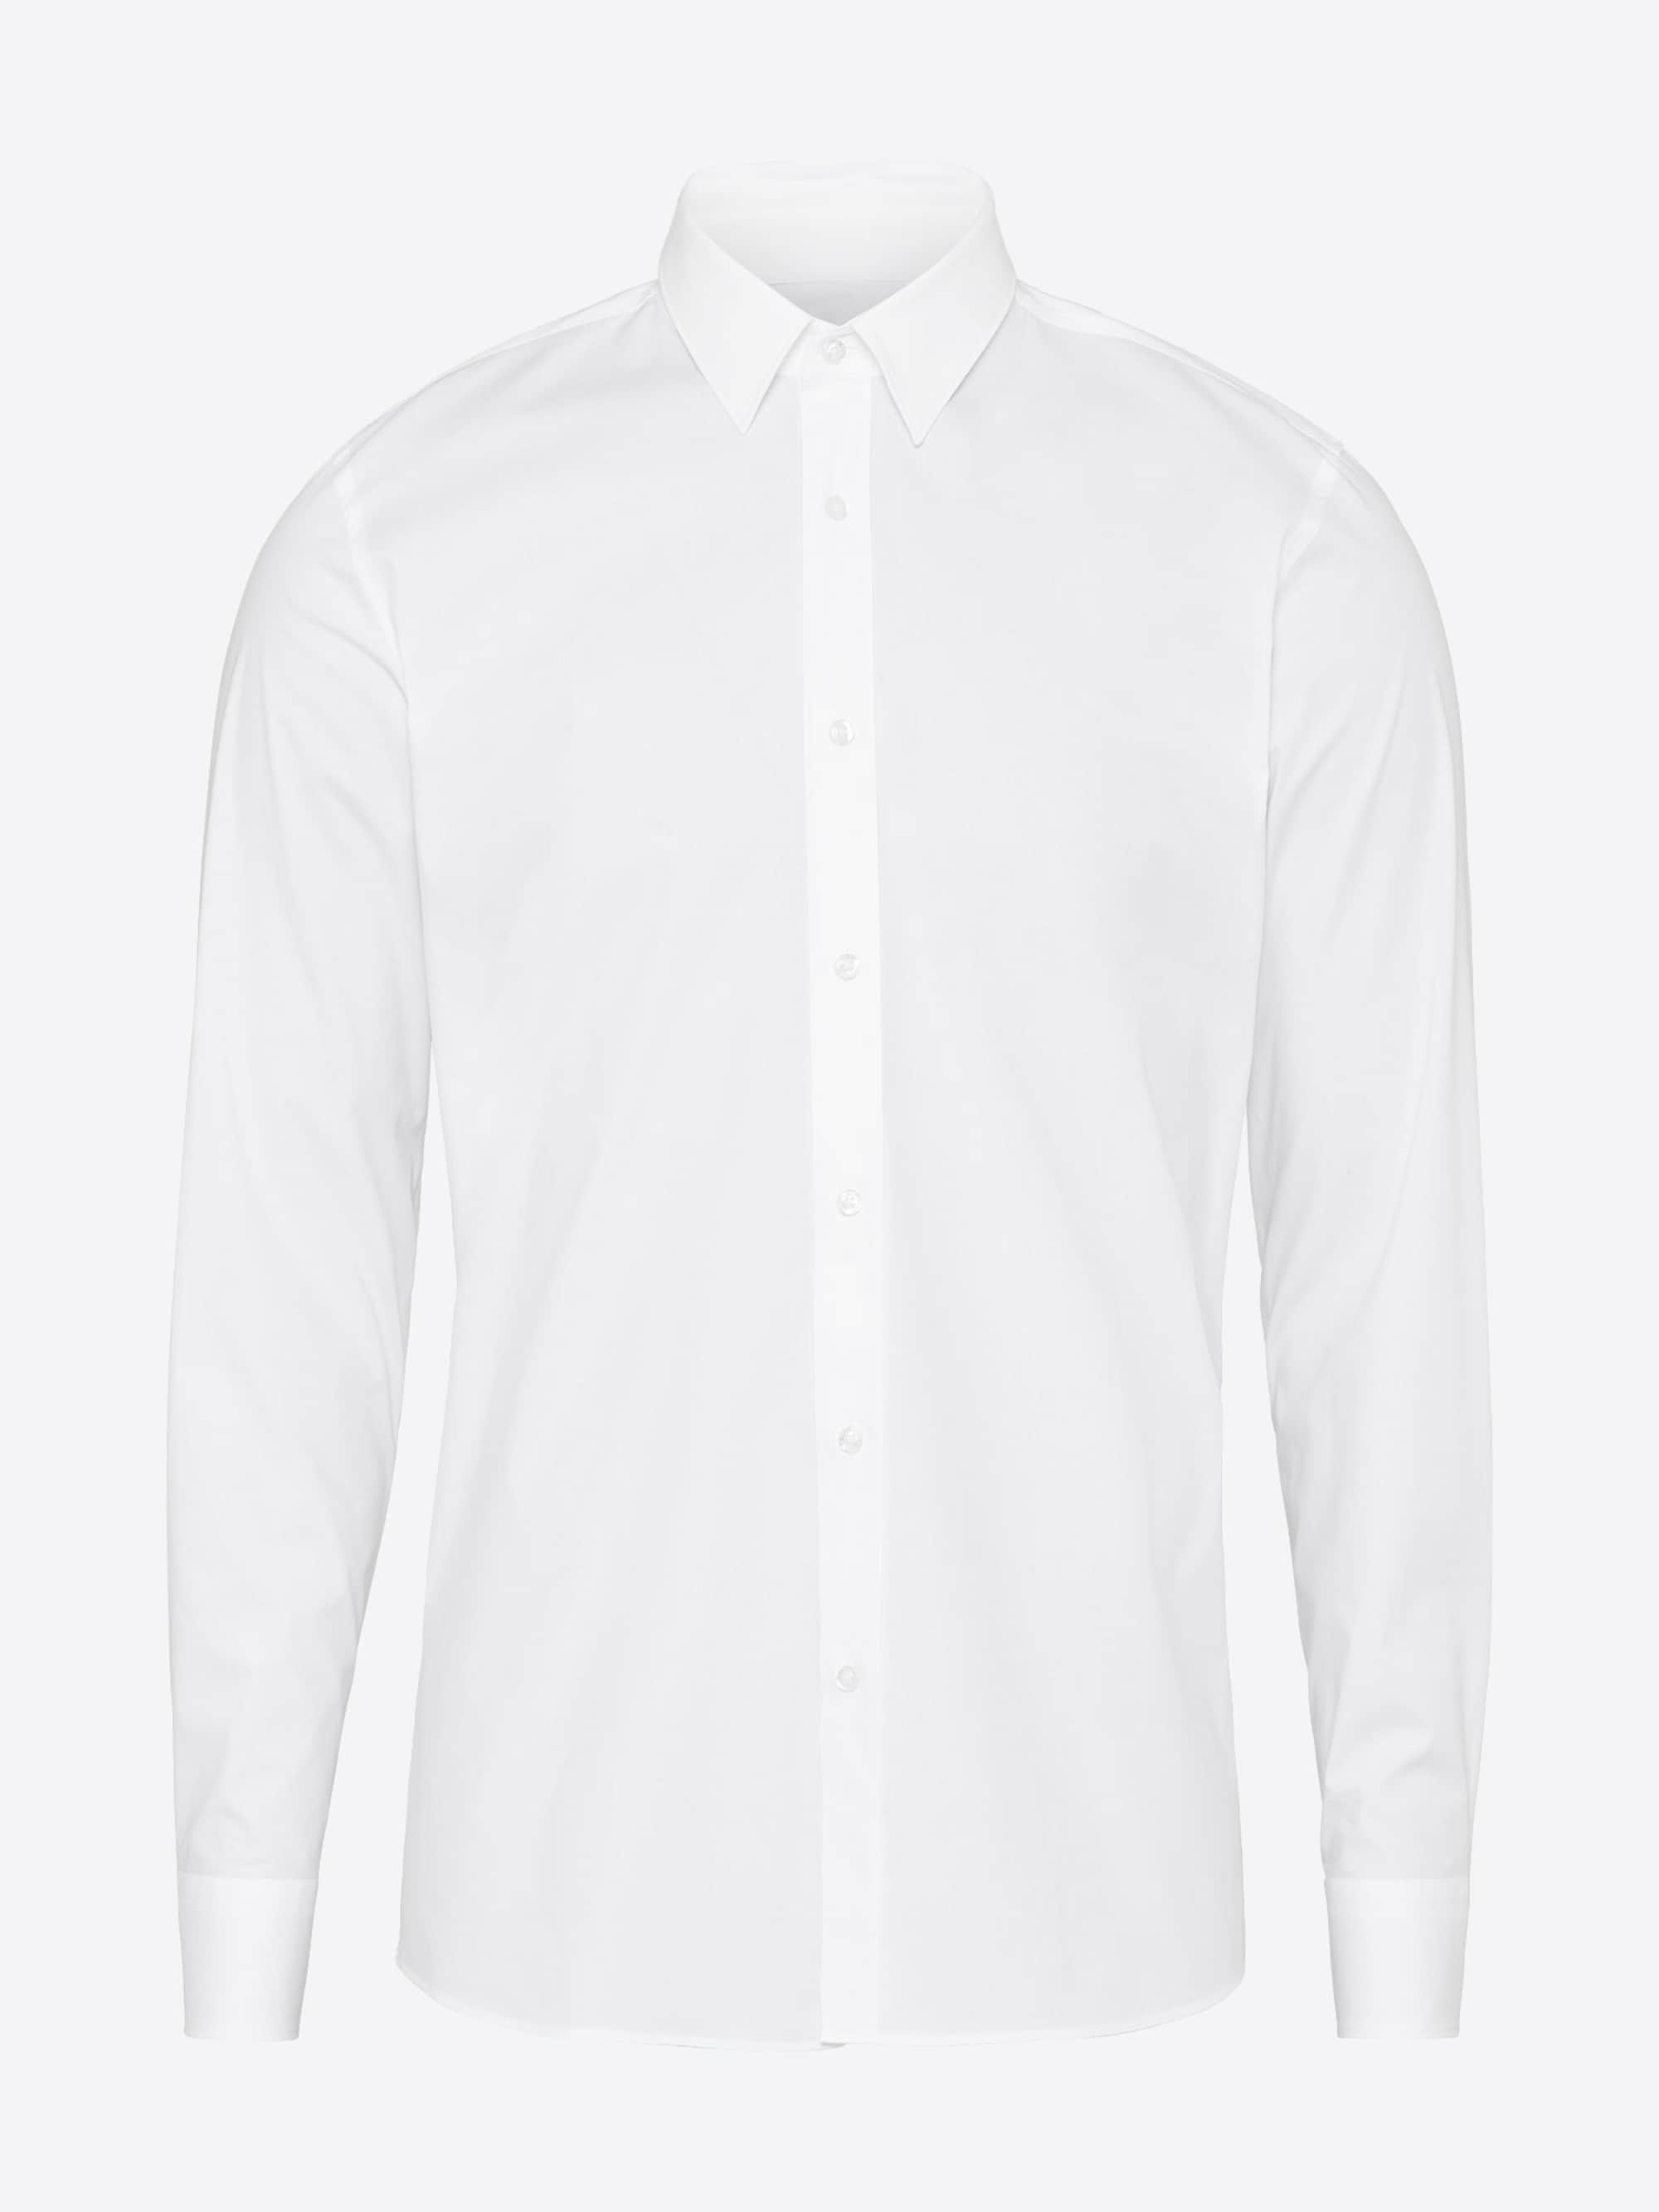 Image of Business-Hemd in Extra Slim Fit ´Elisha01´